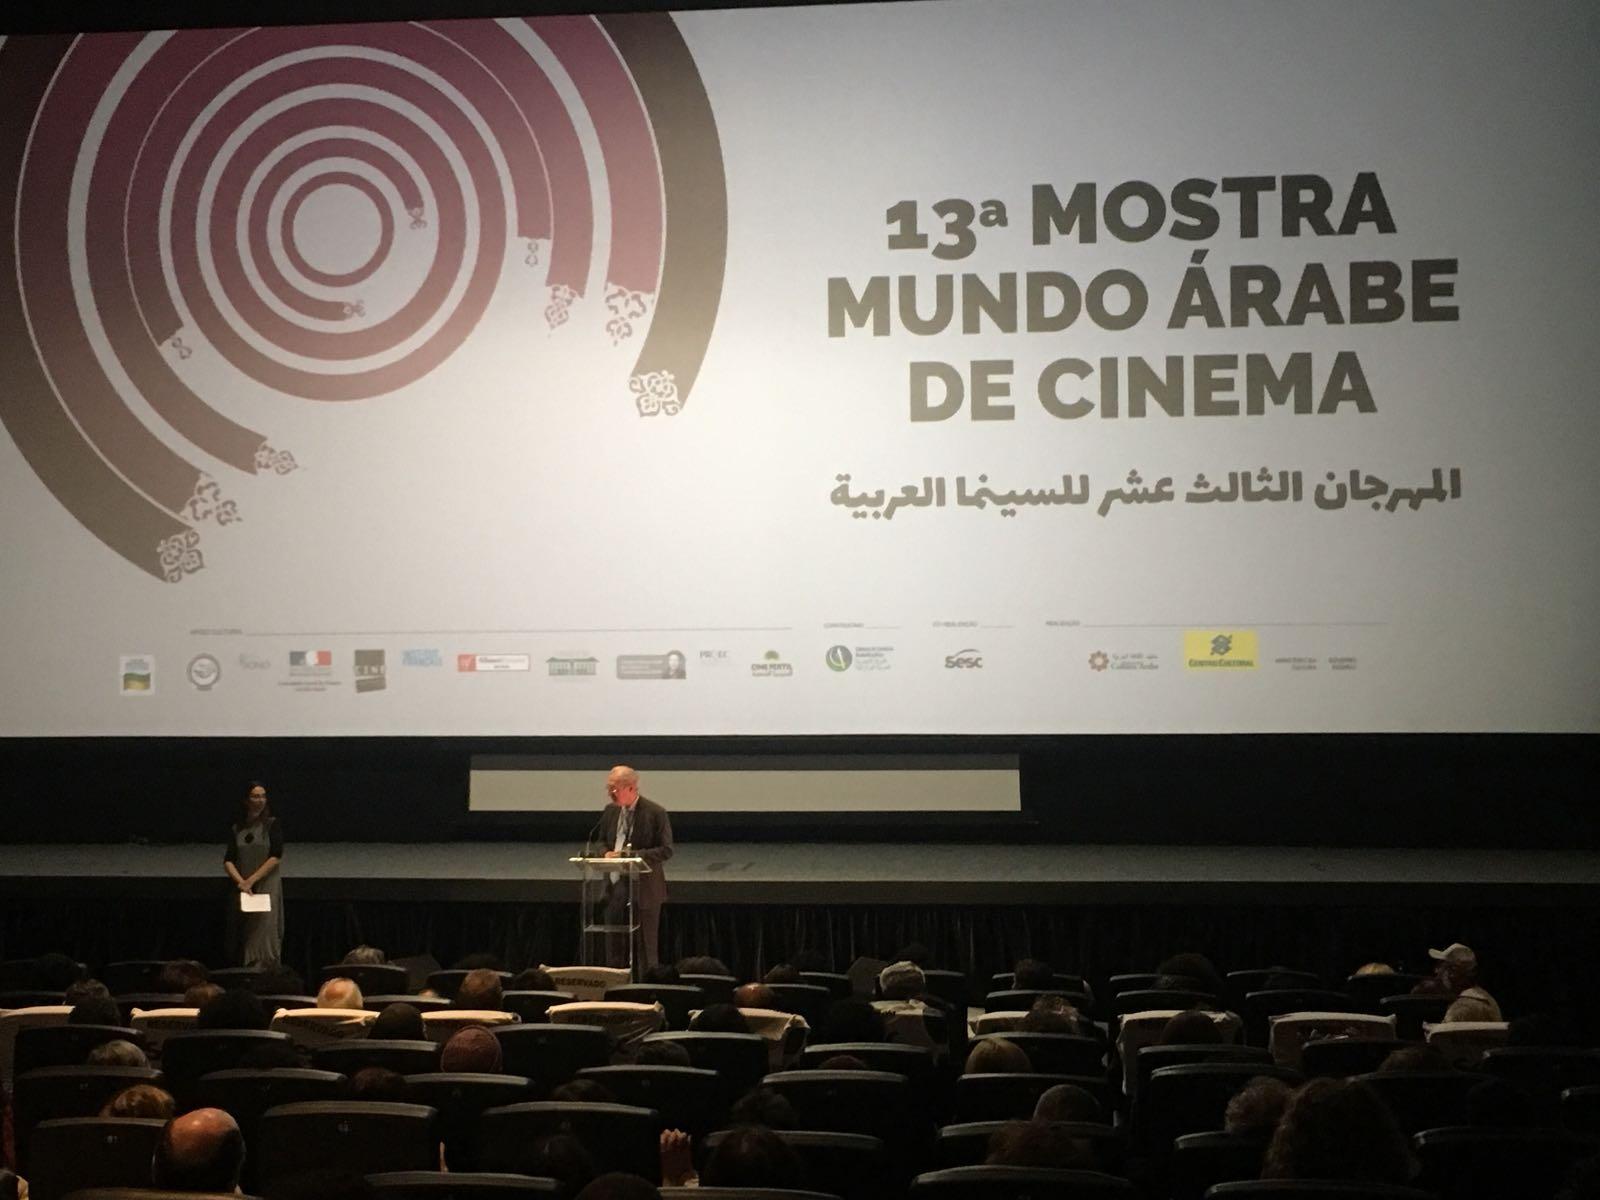 Rubens Hannun na abertura da Mostra Mundo Árabe de Cinema